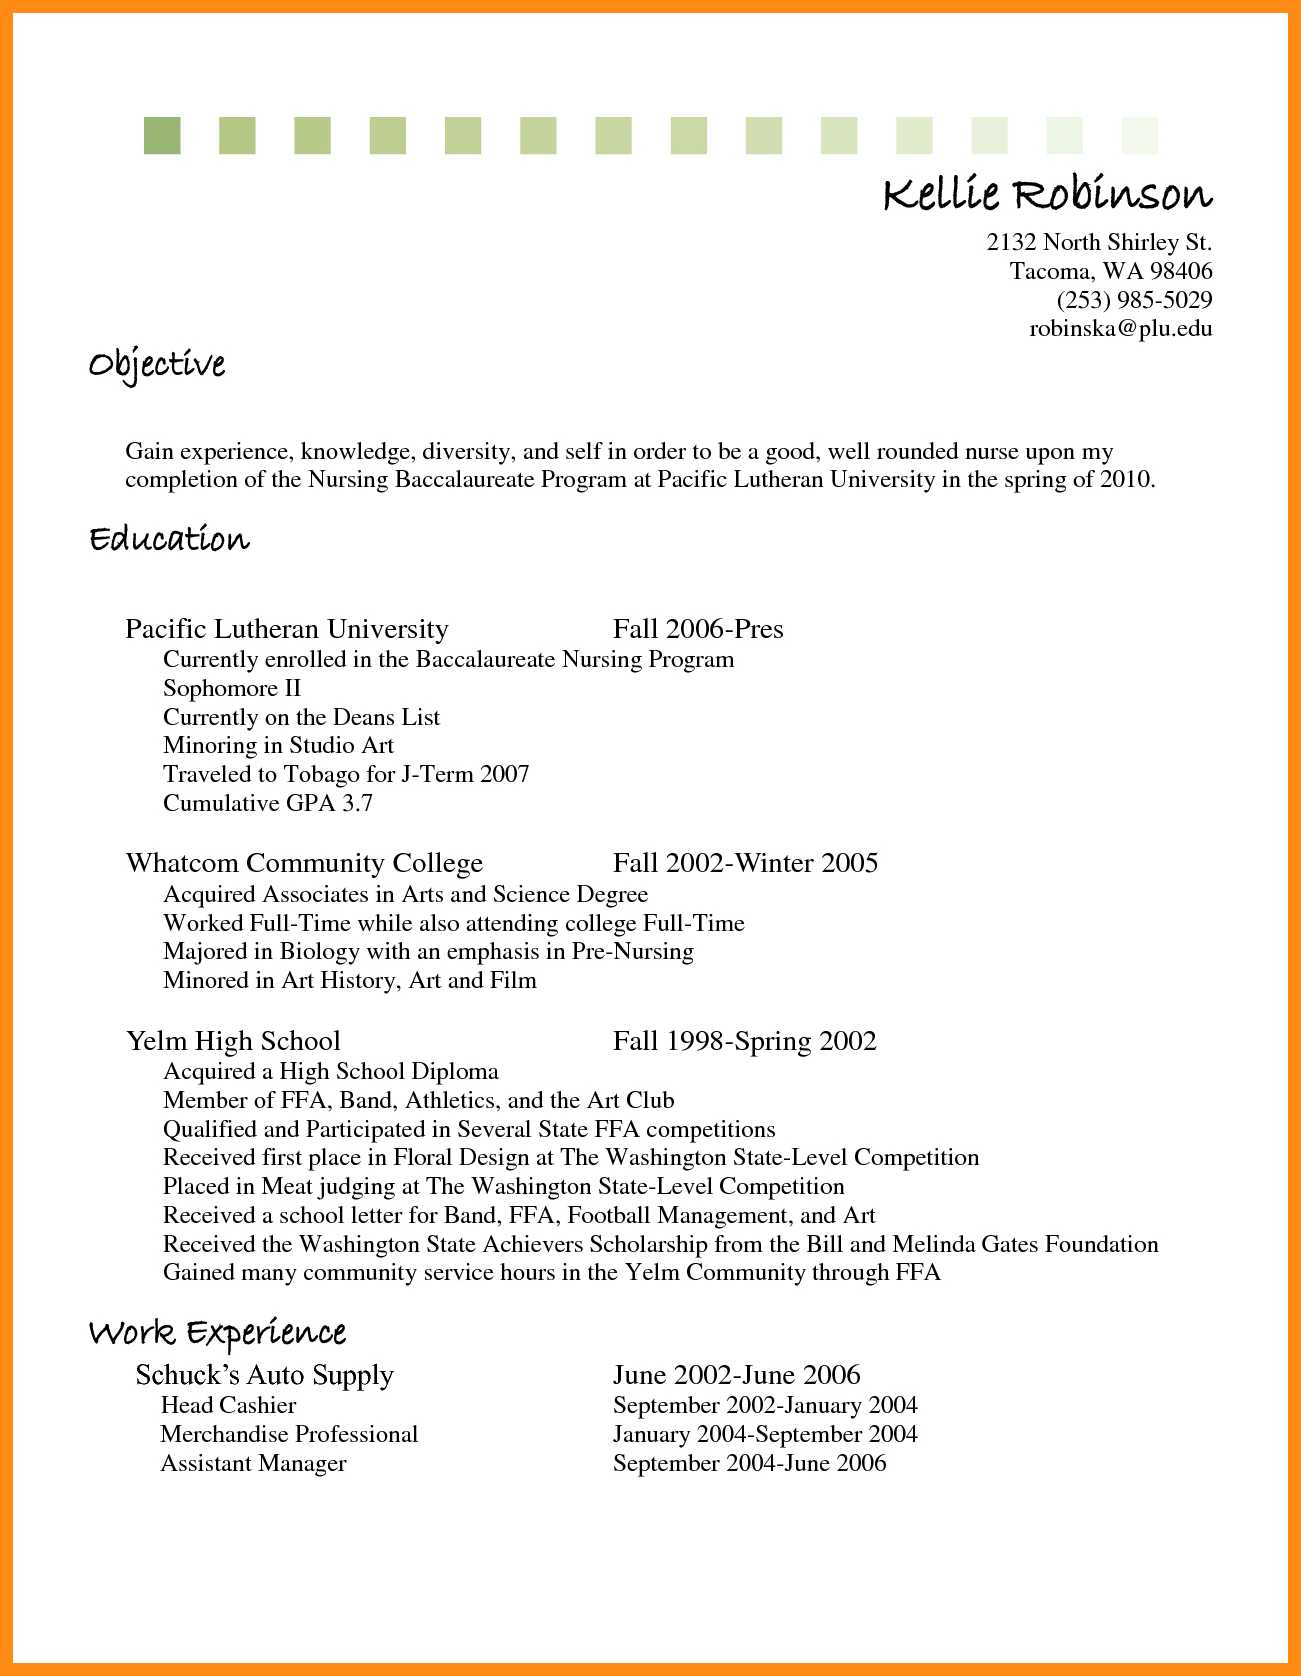 Resume Objective Example Biology Resume Objective Examples Retail Resume Template Image Job Objectives New Sales Associate resume objective example wikiresume.com